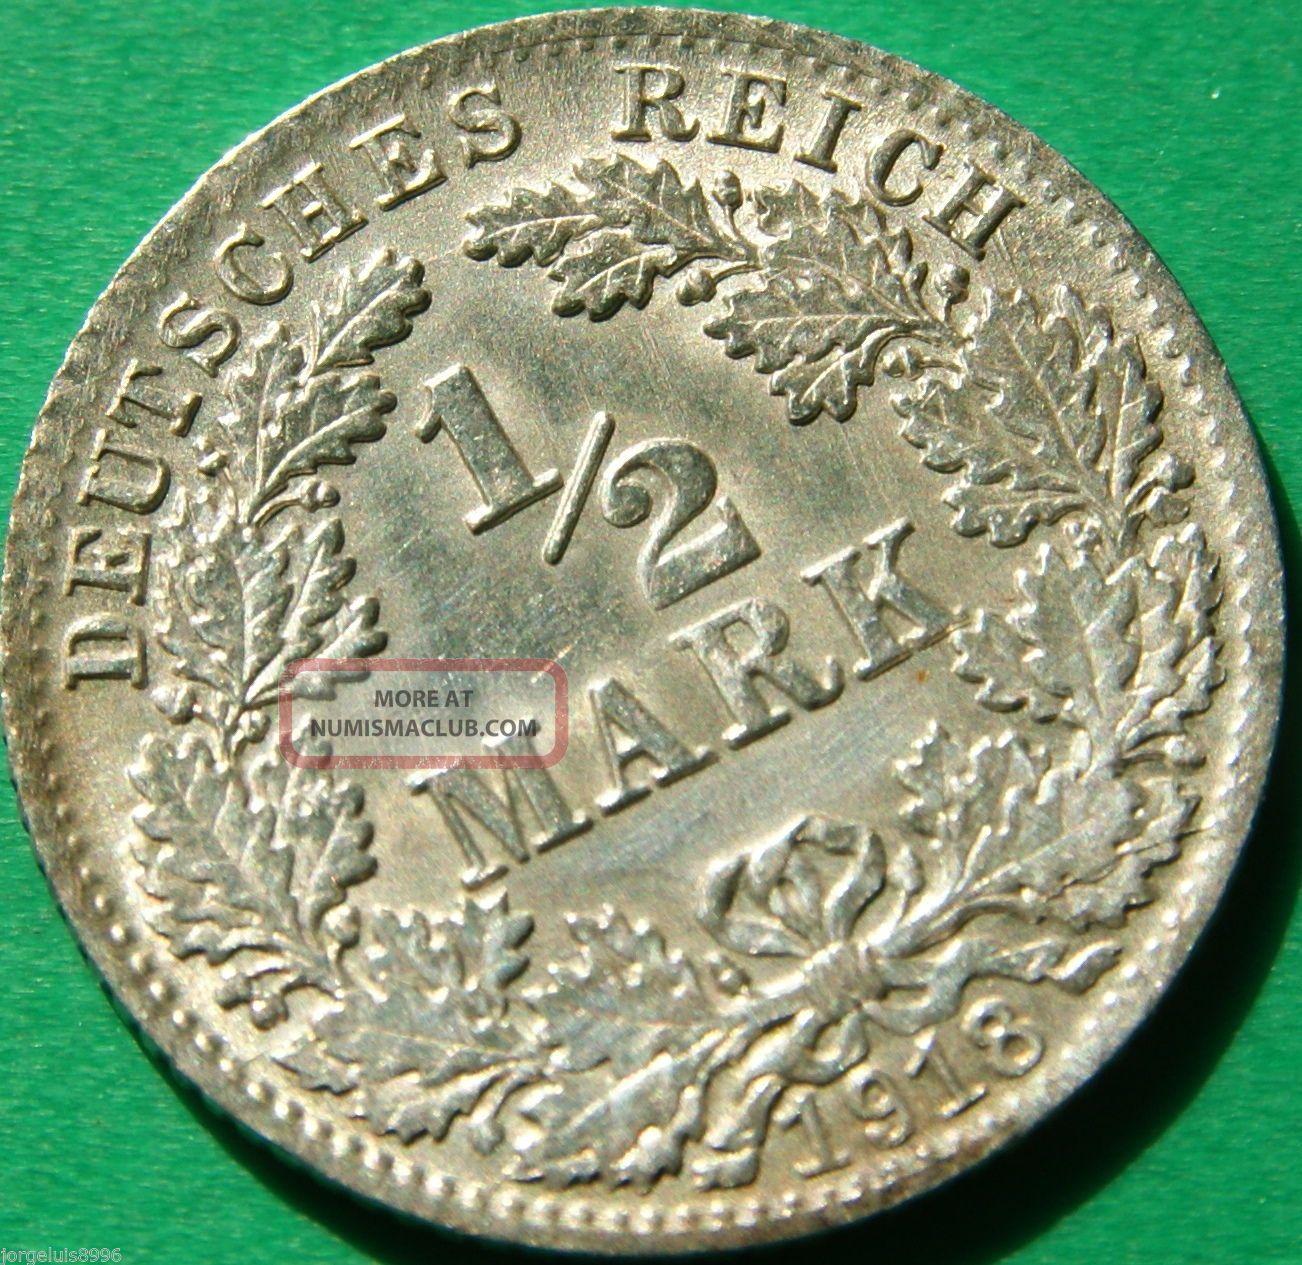 German Empire Silver Coin 1918 D 1/2 Mark Patina Germany photo